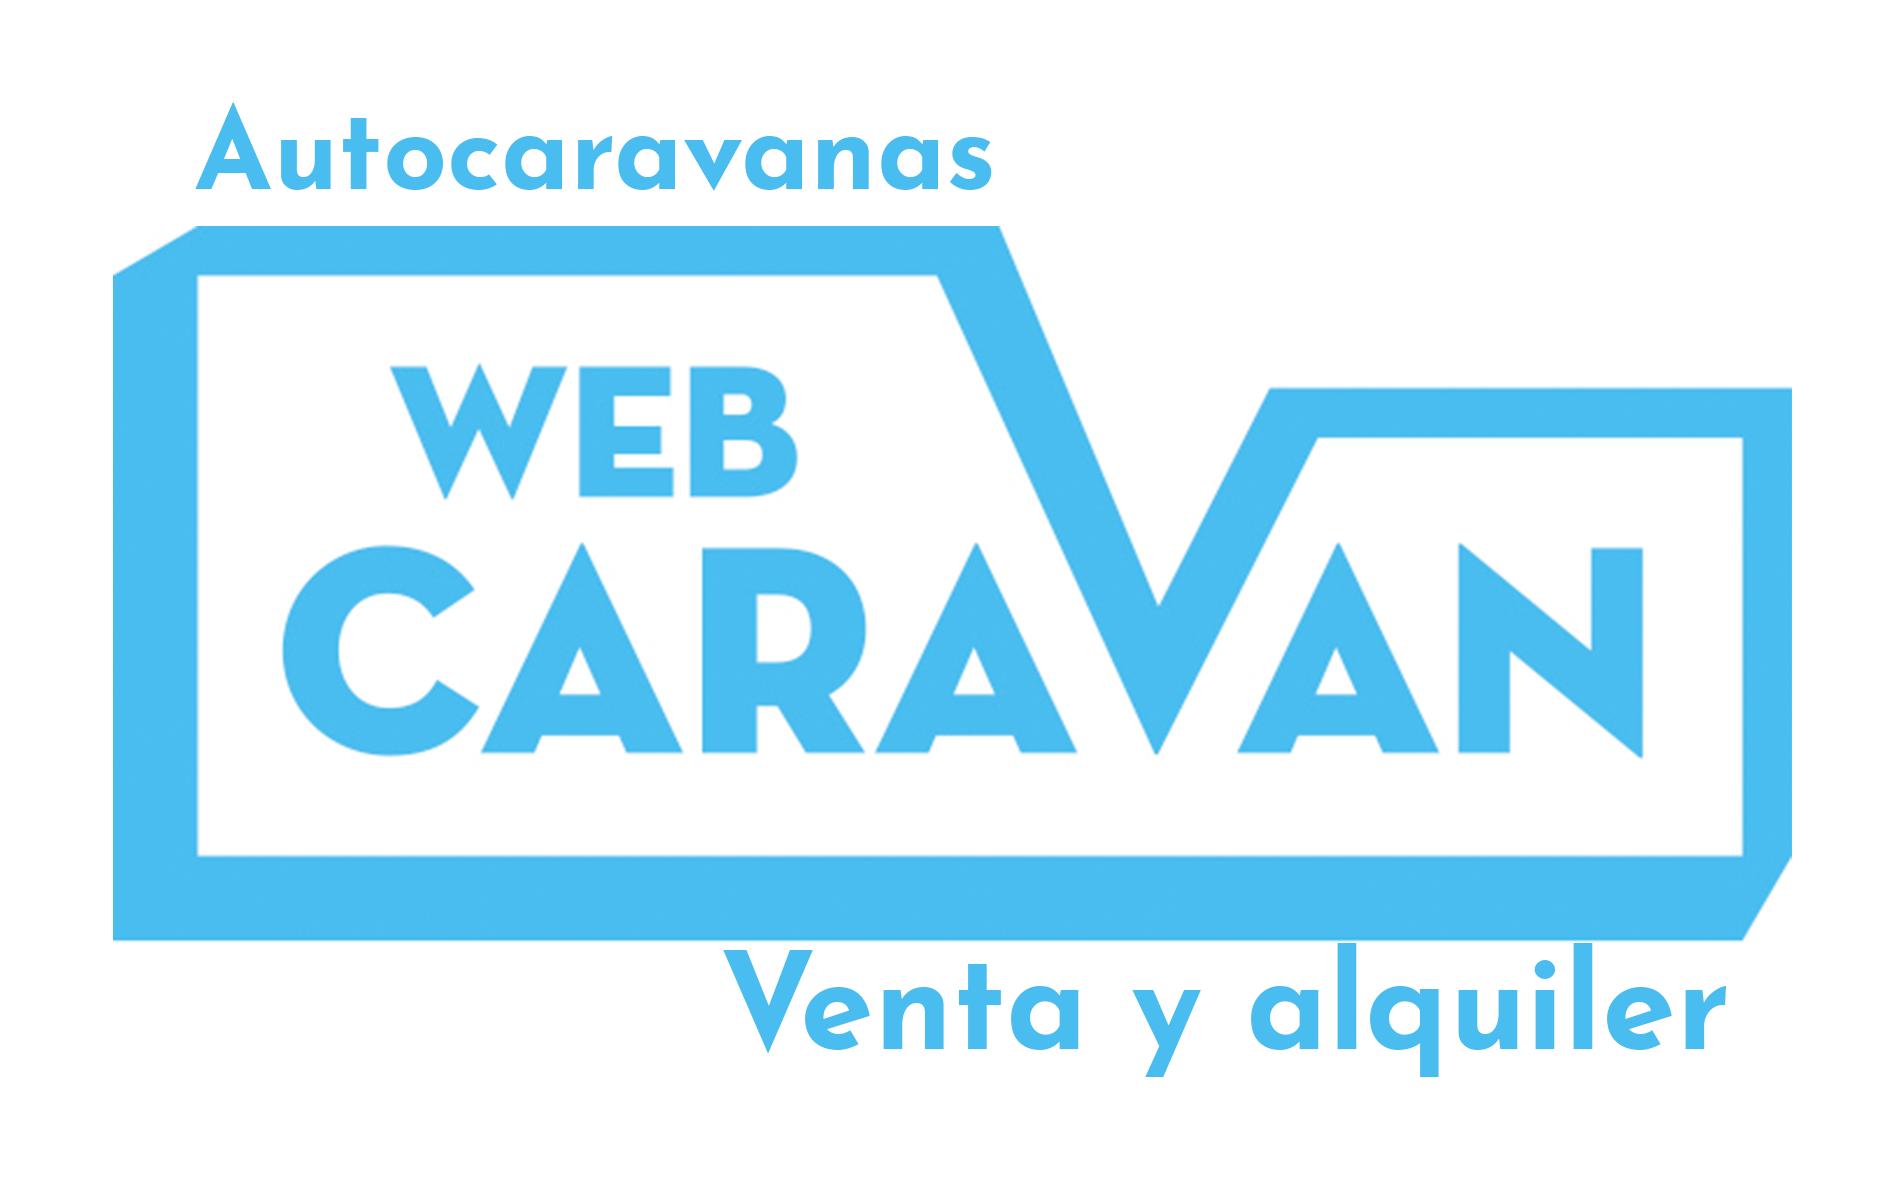 https://ev4doc.s3.eu-west-1.amazonaws.com/webcaravan/documentos/webcaravan/catalogo/9467/e9454526952679cf62002a1dac706ede.png